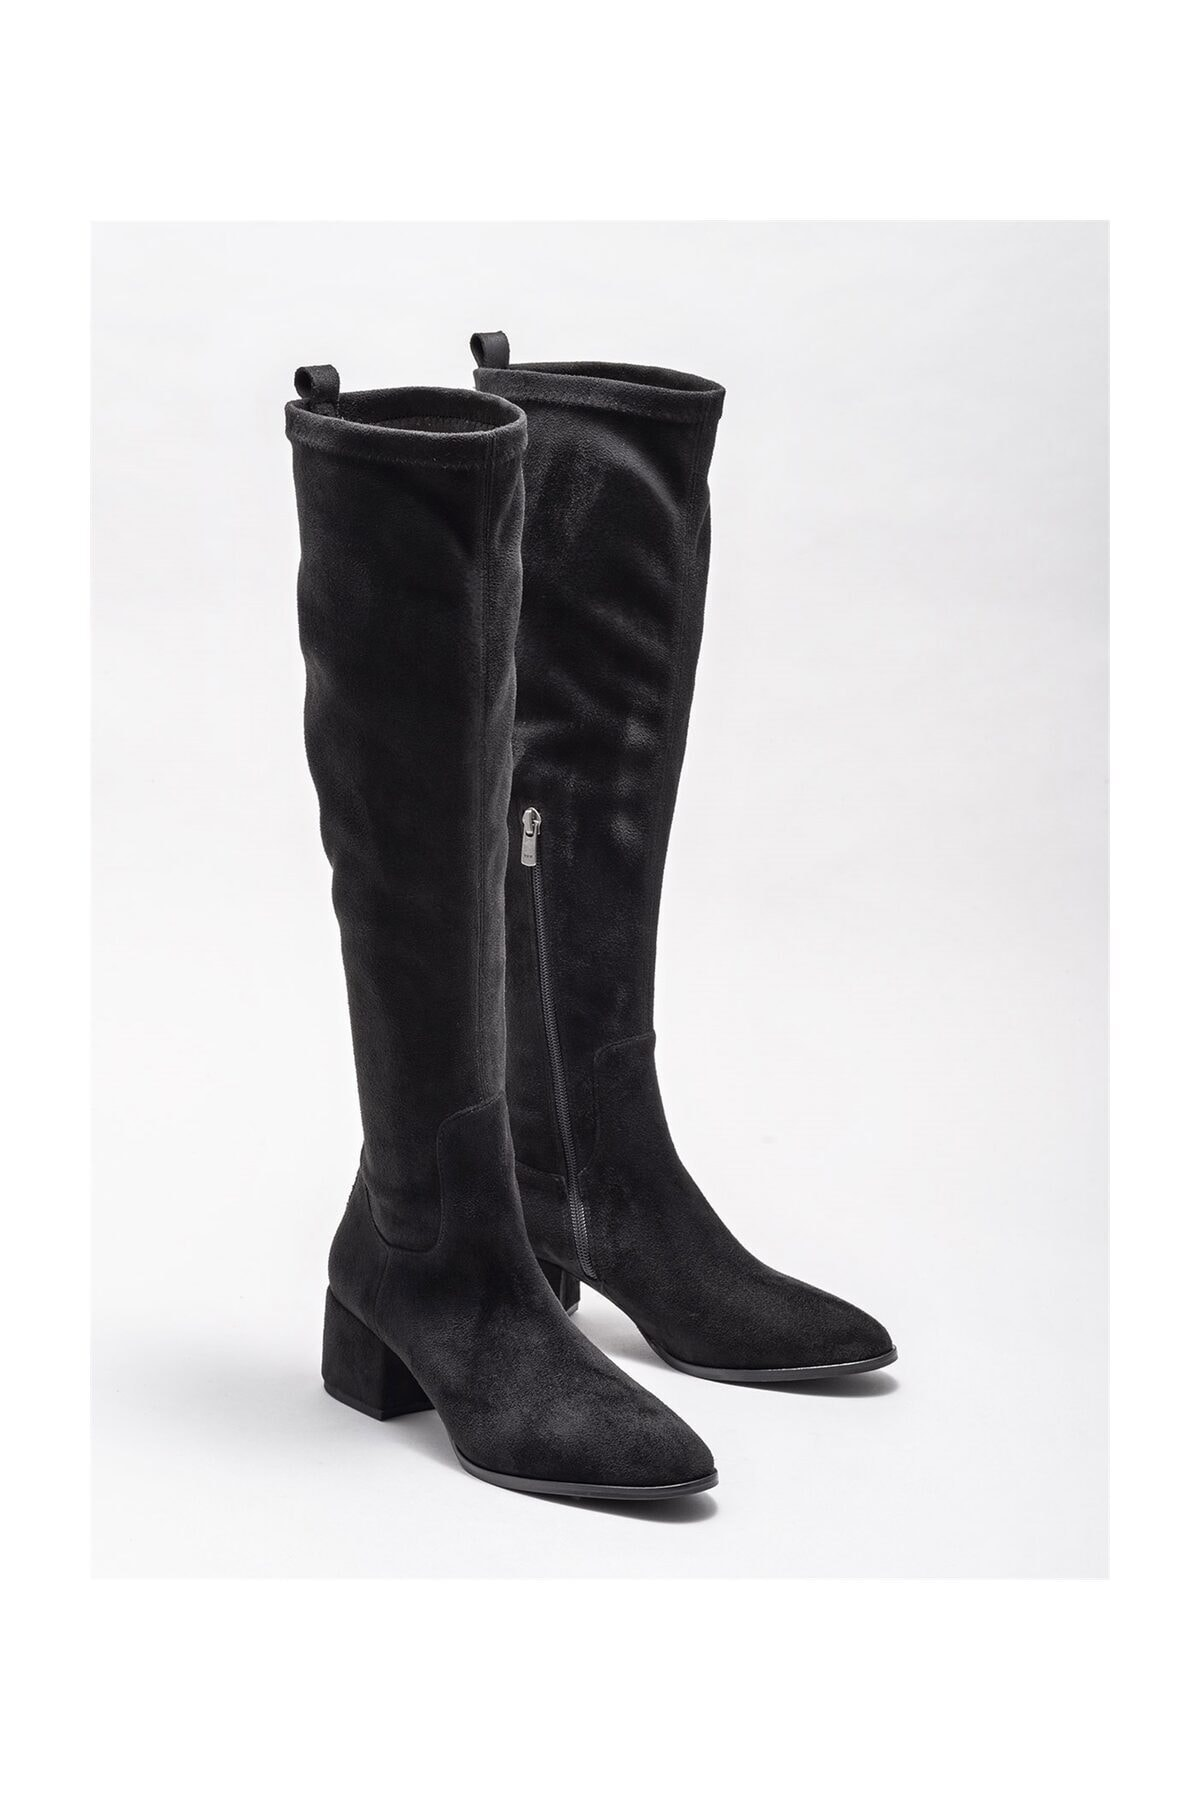 Elle Shoes Kadın Ravendra Sıyah Çizme 20KTO34102 2